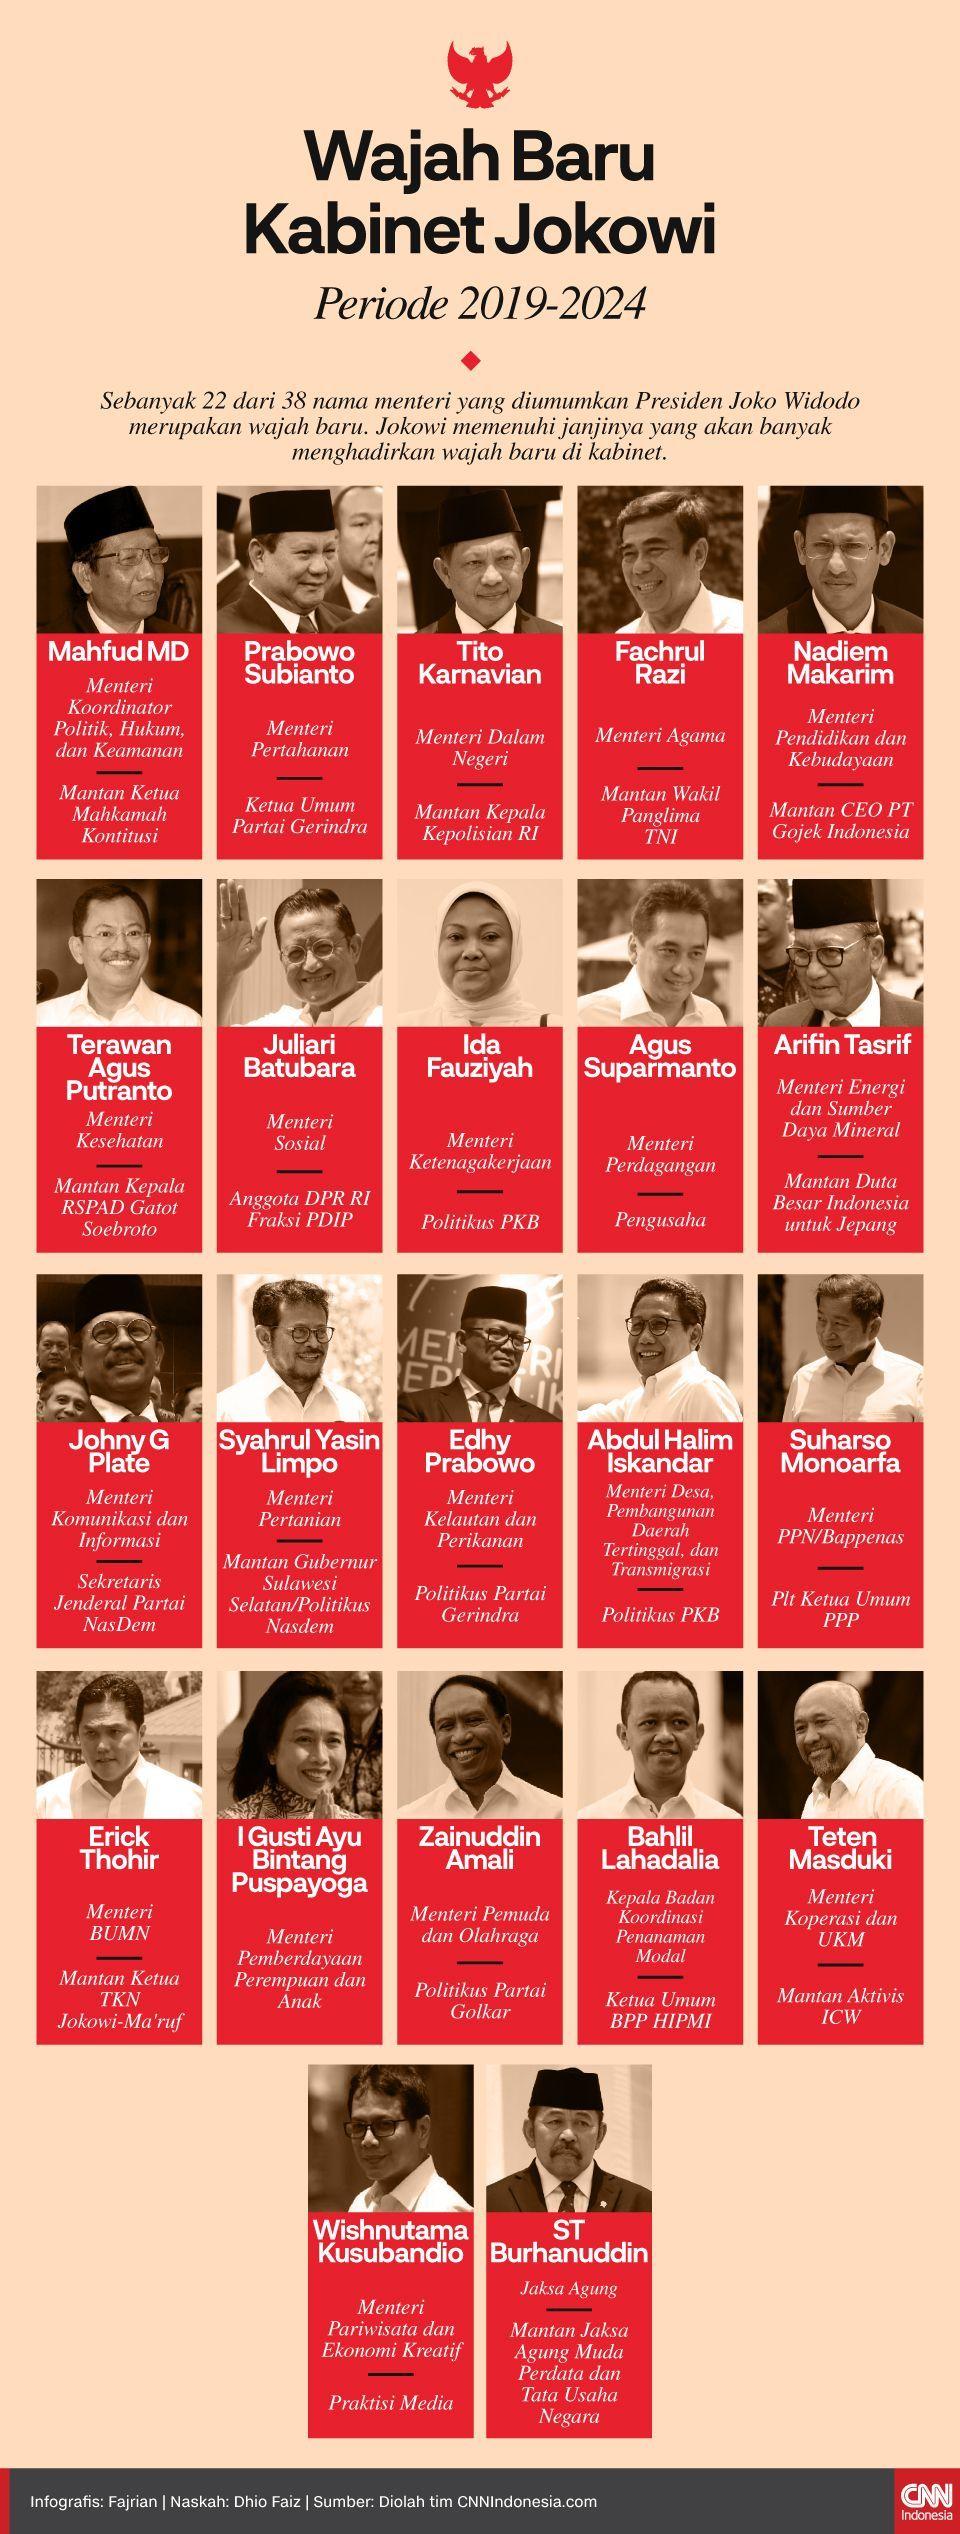 Infografis Wajah Baru Kabinet Jokowi